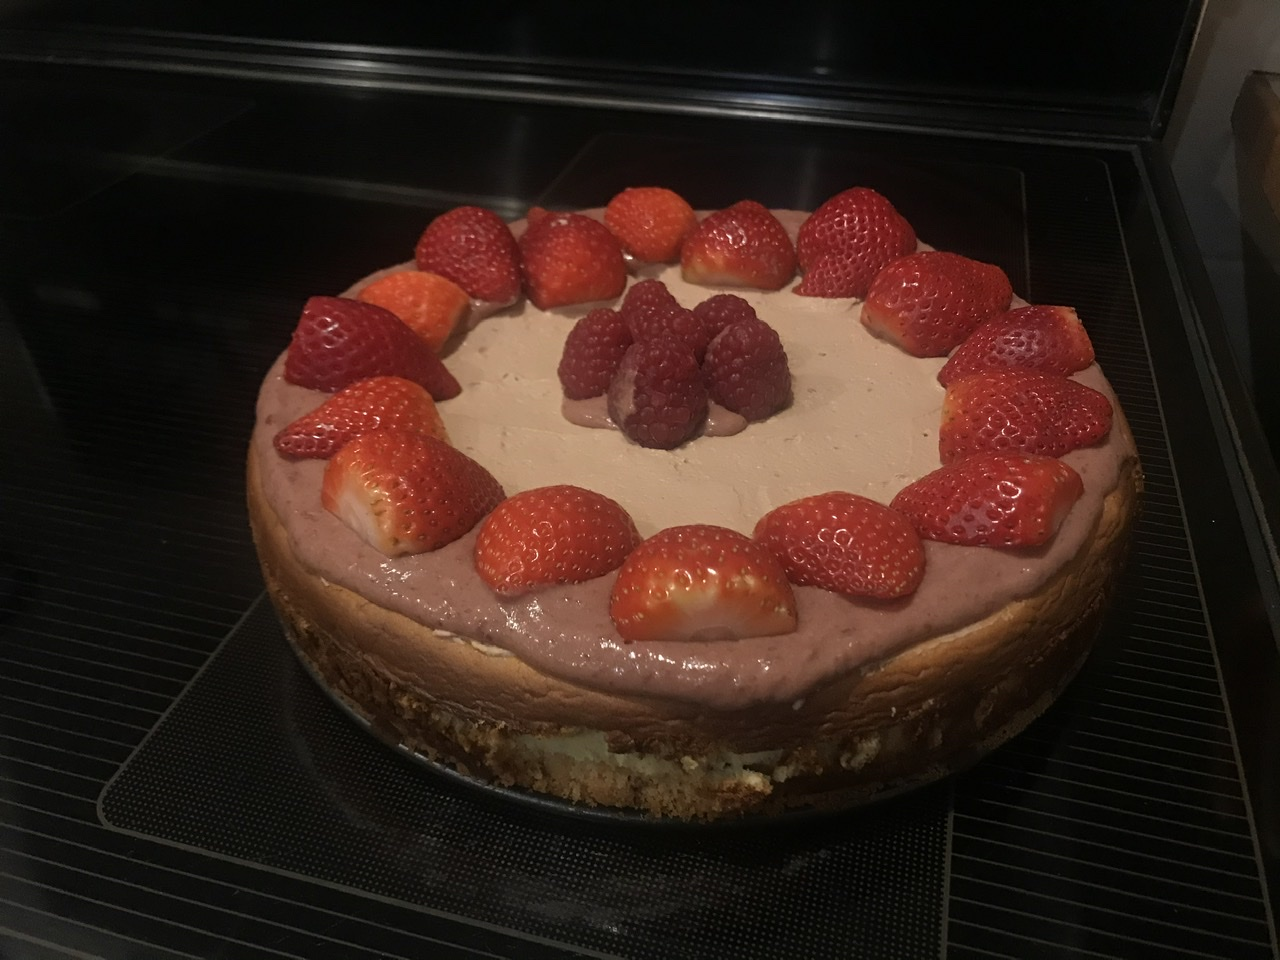 PHILADELPHIA INDULGENCE Chocolate Mousse Cheesecake Elize Coetzee